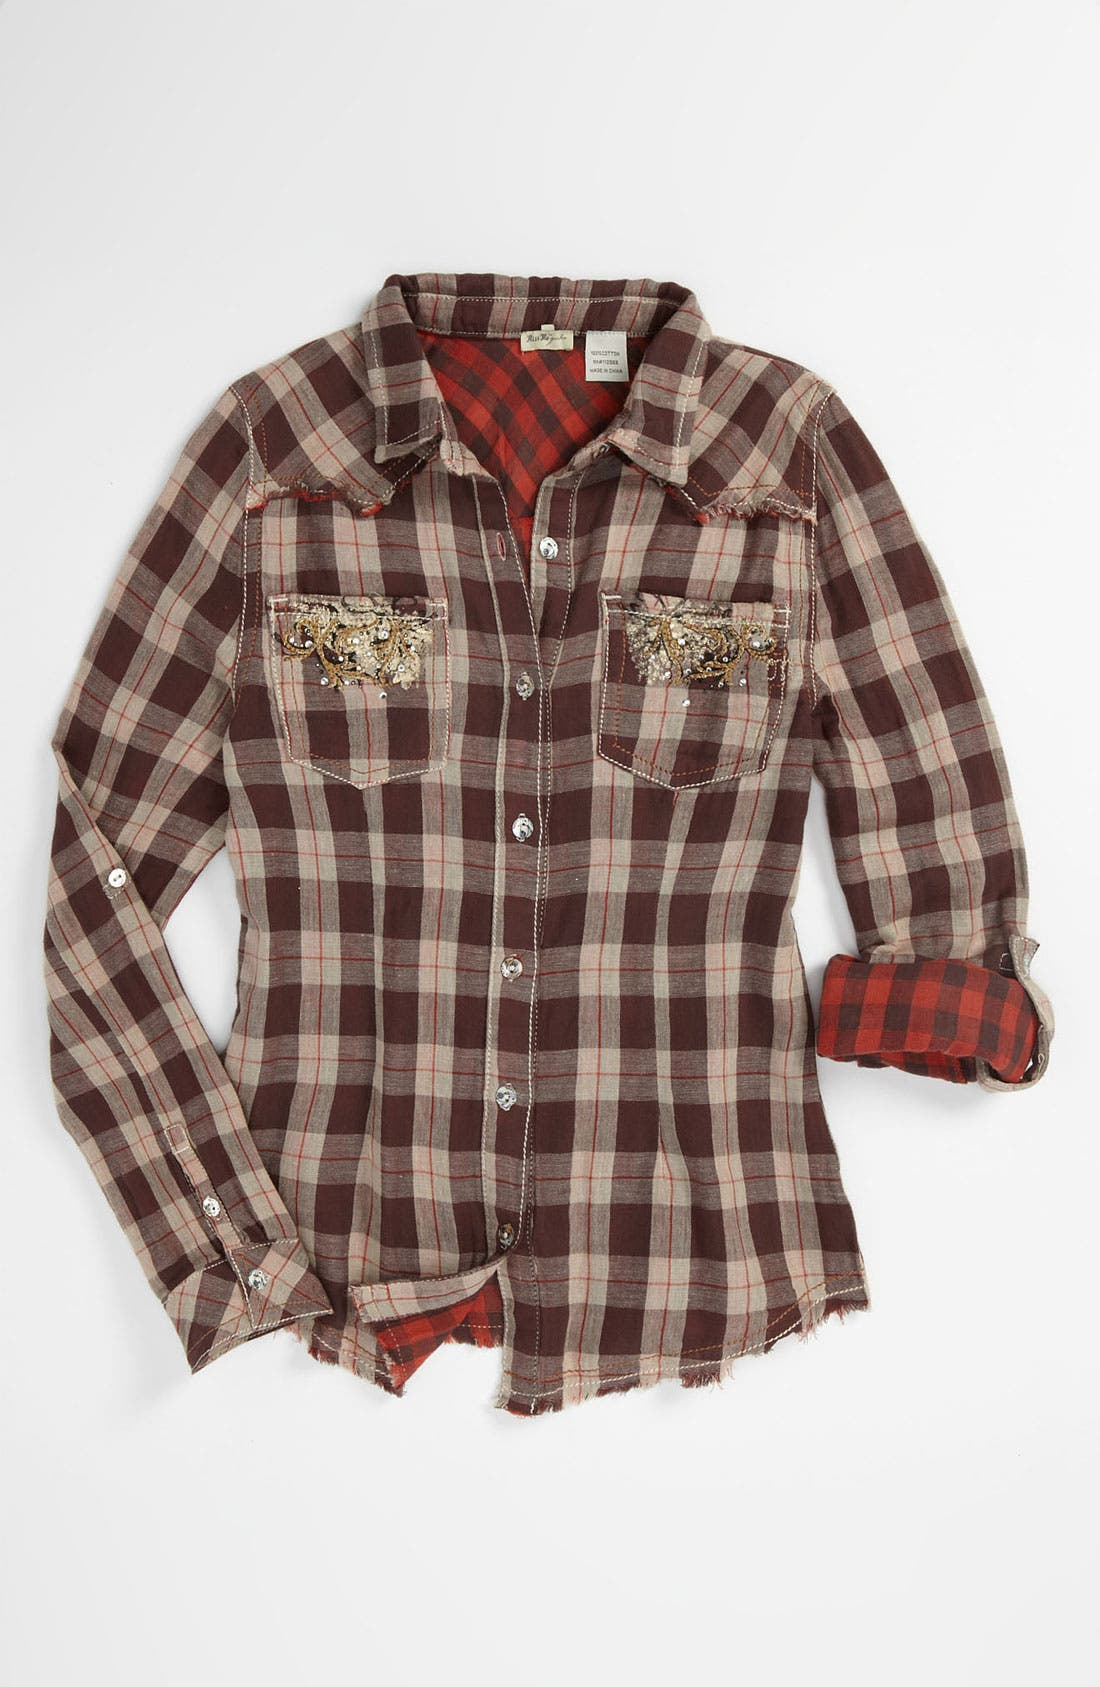 Alternate Image 1 Selected - Miss Me Plaid Shirt (Big Girls)